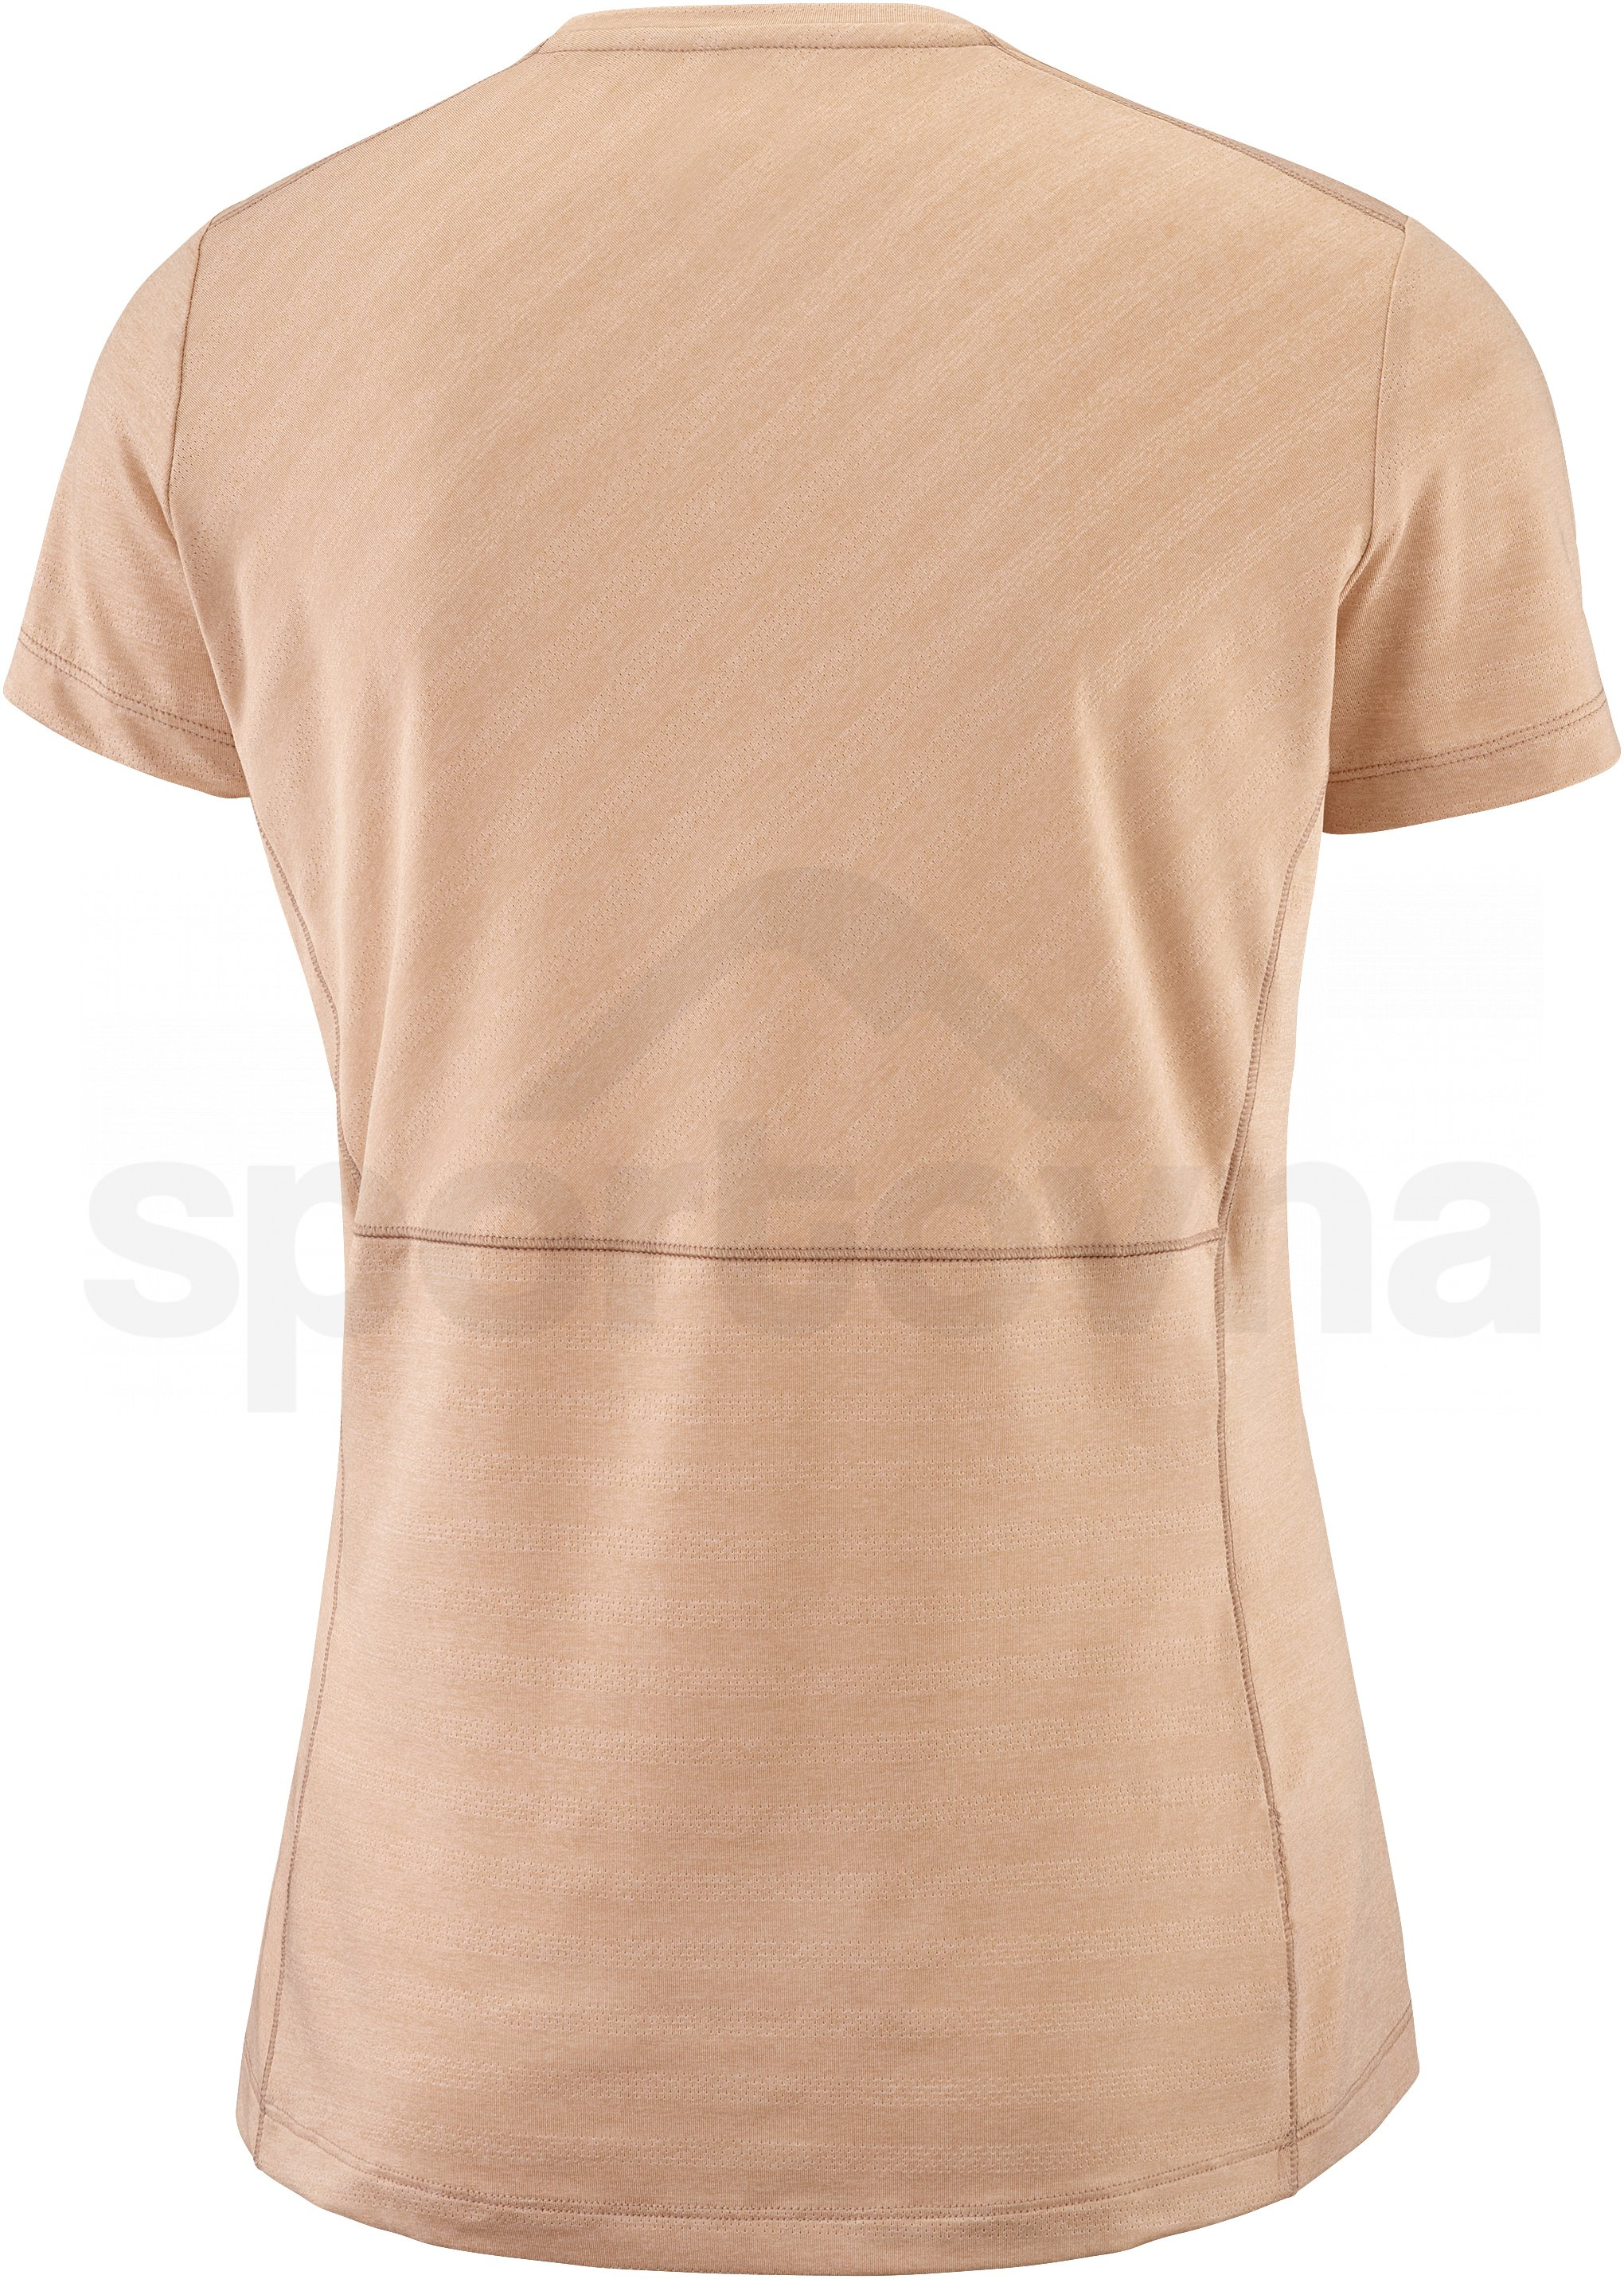 Tričko Salomon XA Tee W - růžová